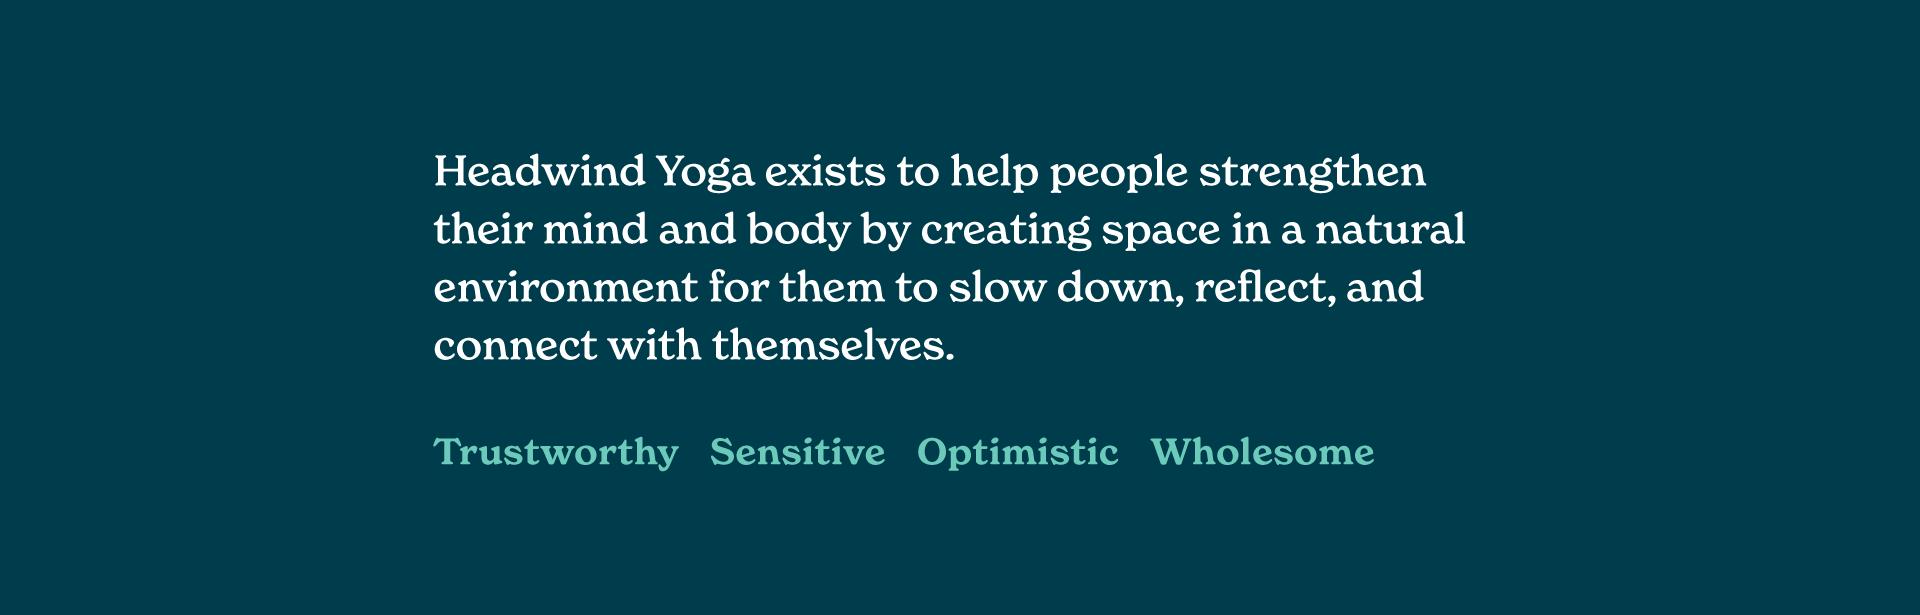 headwind-yoga-positioning